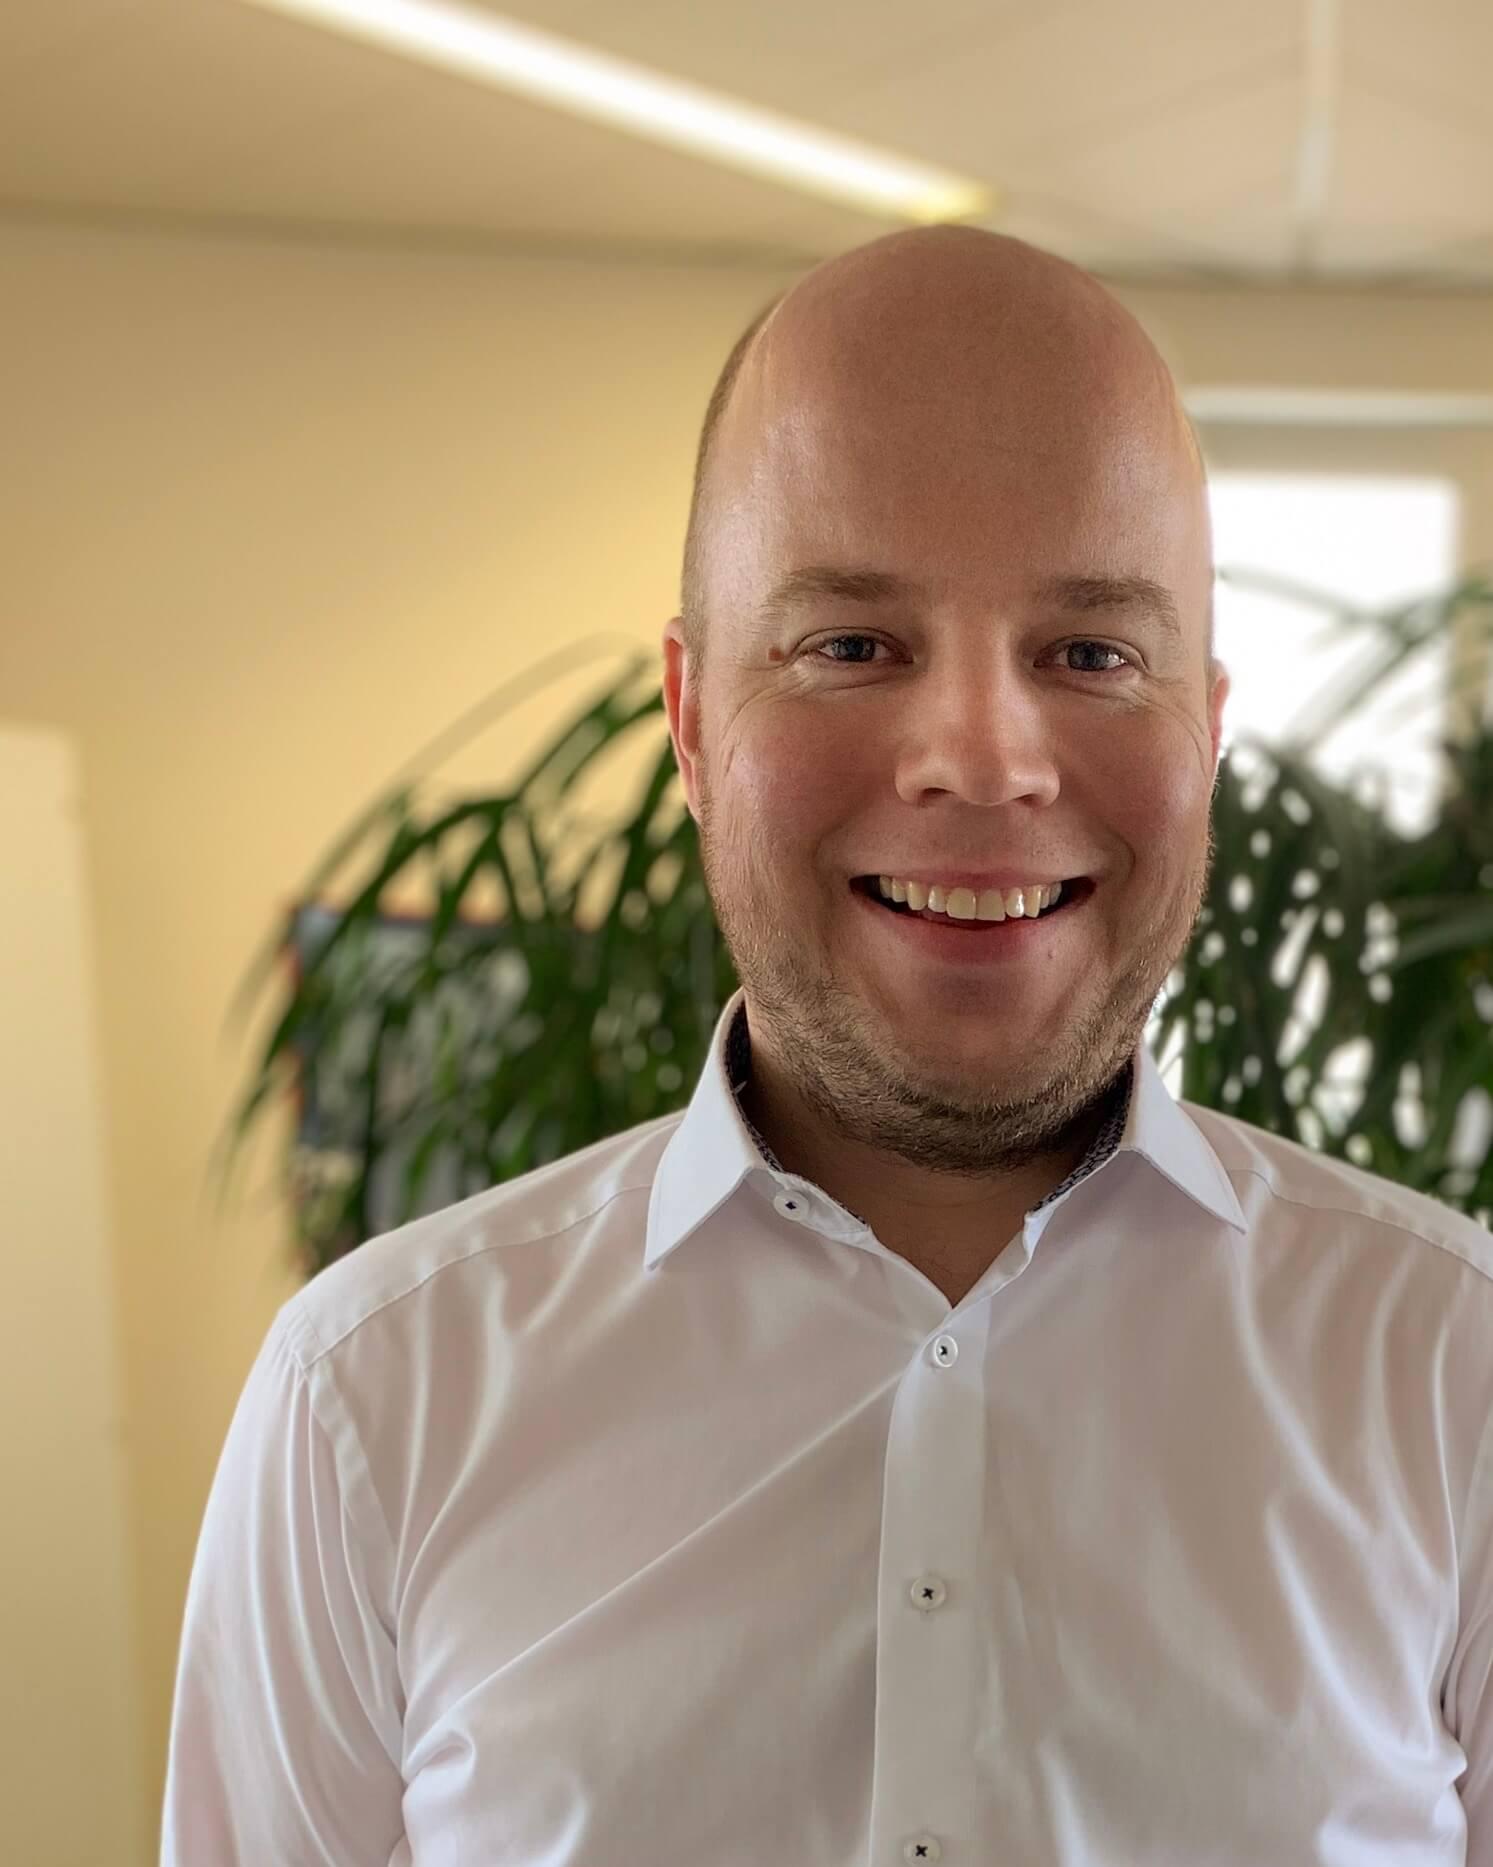 SEA-Agentur Hamburg Experte Sven Huwald